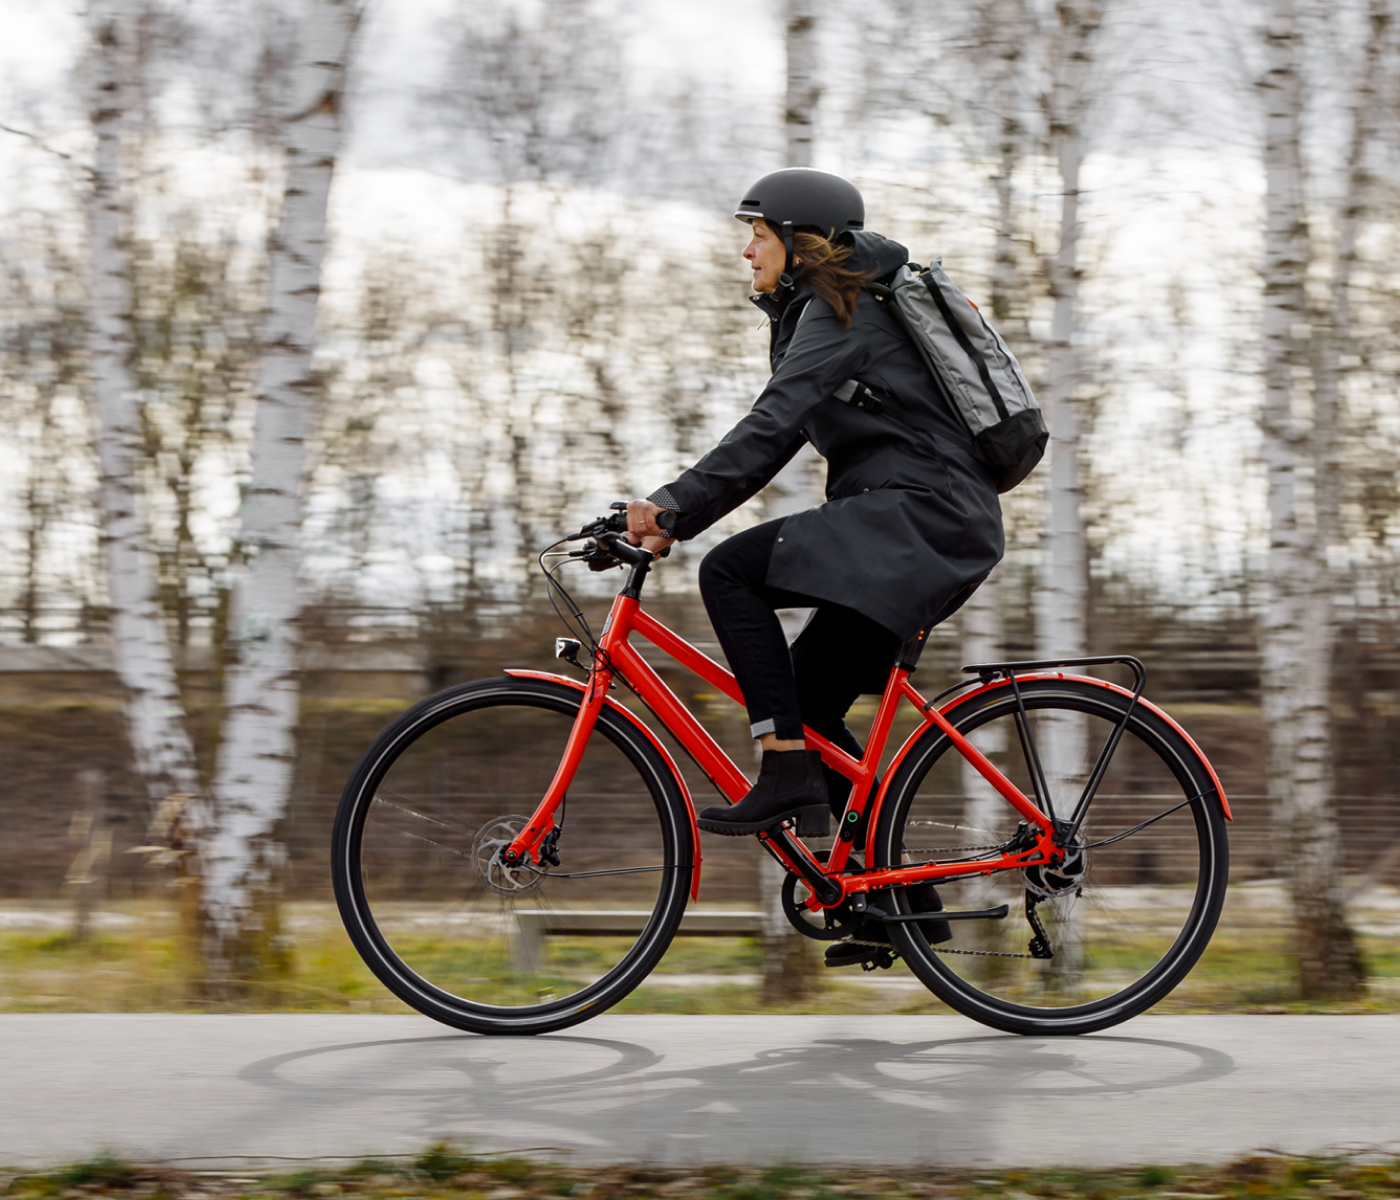 Female Ampler rider on Stellar during colder weather